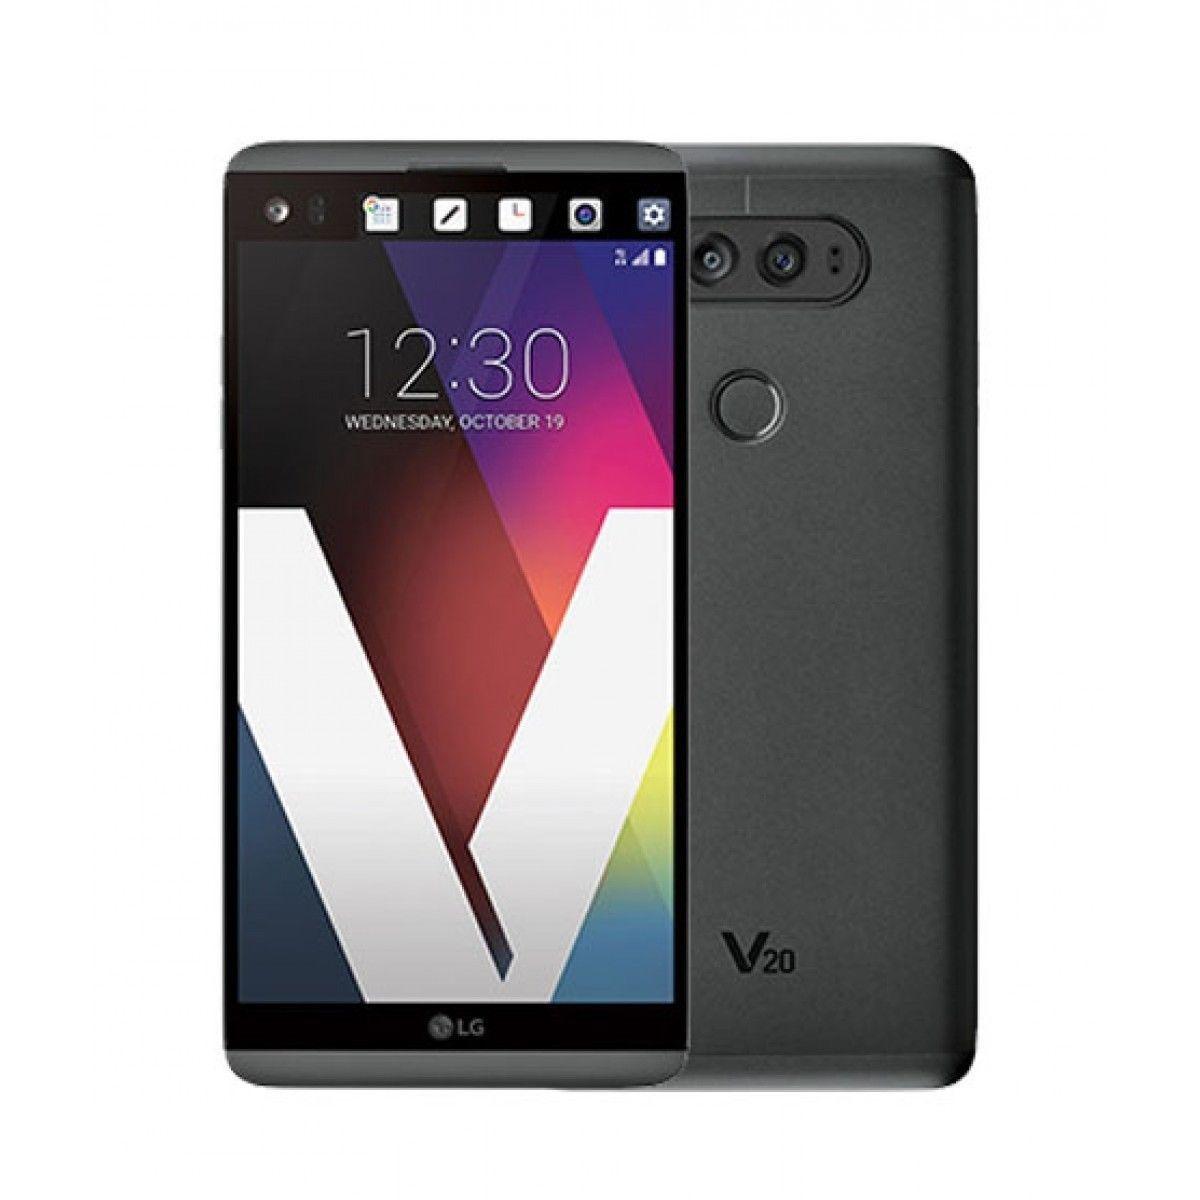 LG V20 H918 TITAN 64GB (TMobile USA) GSM LTE 4G 5.8